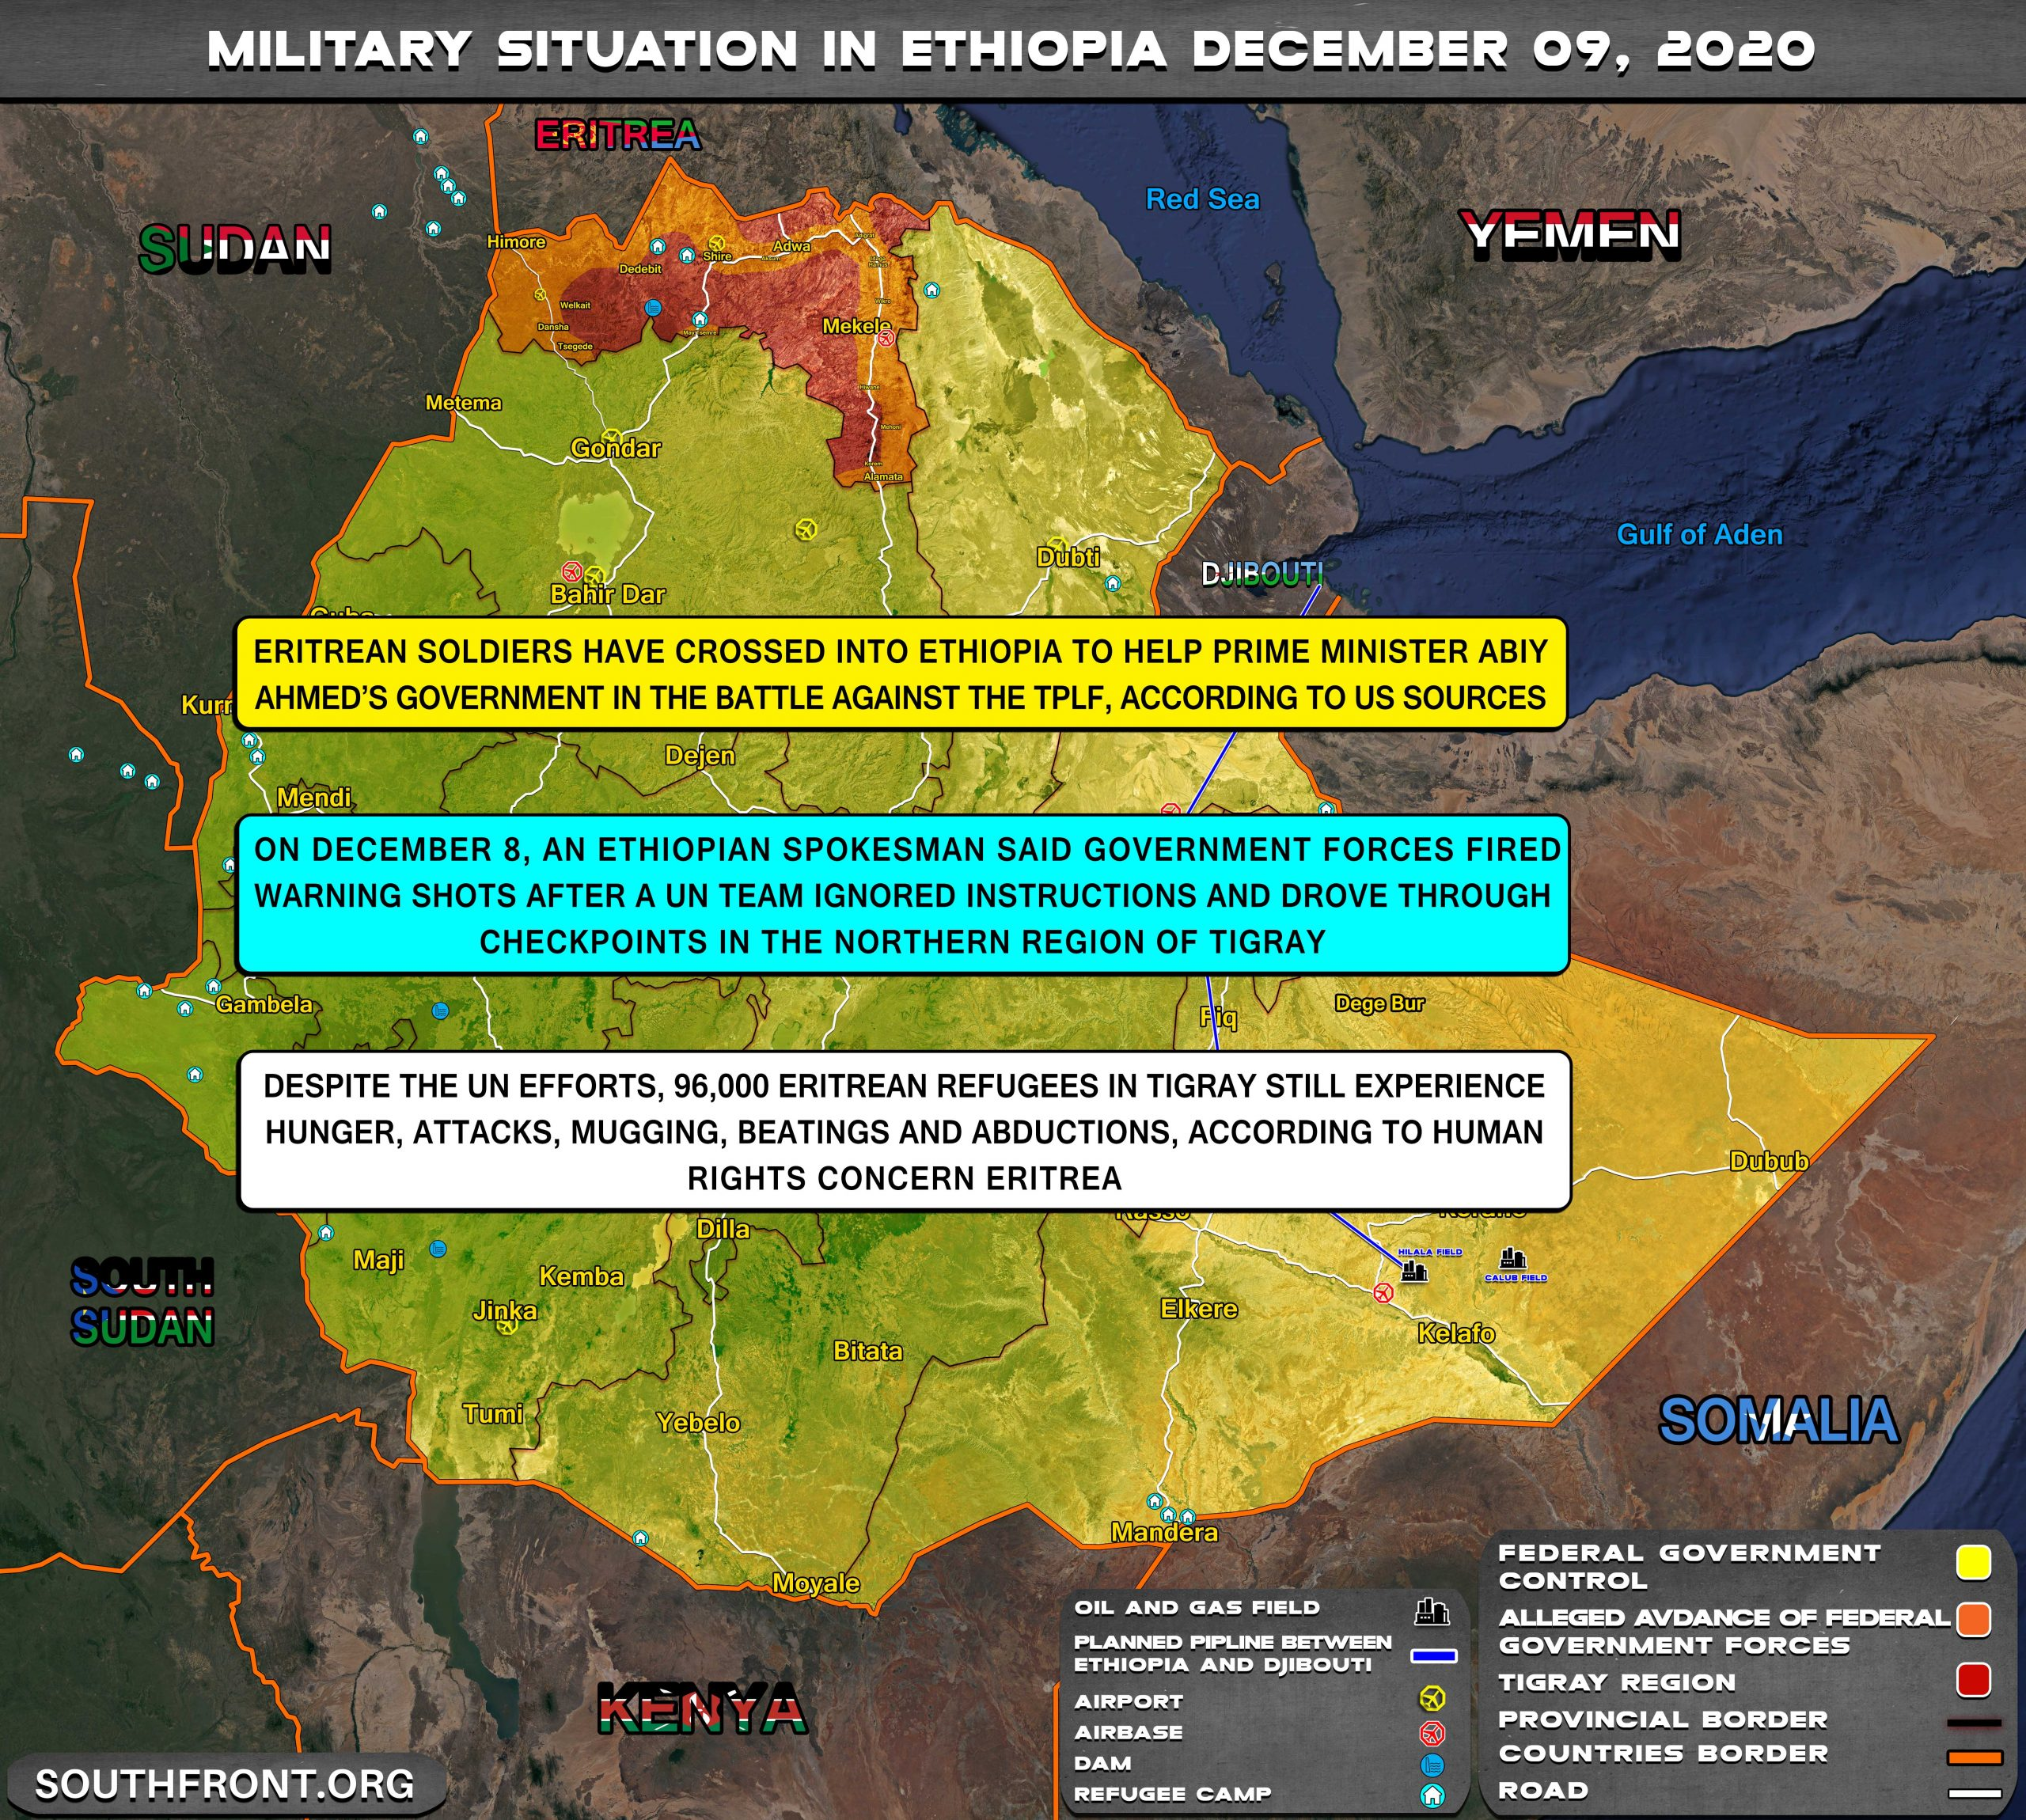 Eritrean Armed Forces Entered Civil War In Ethiopia